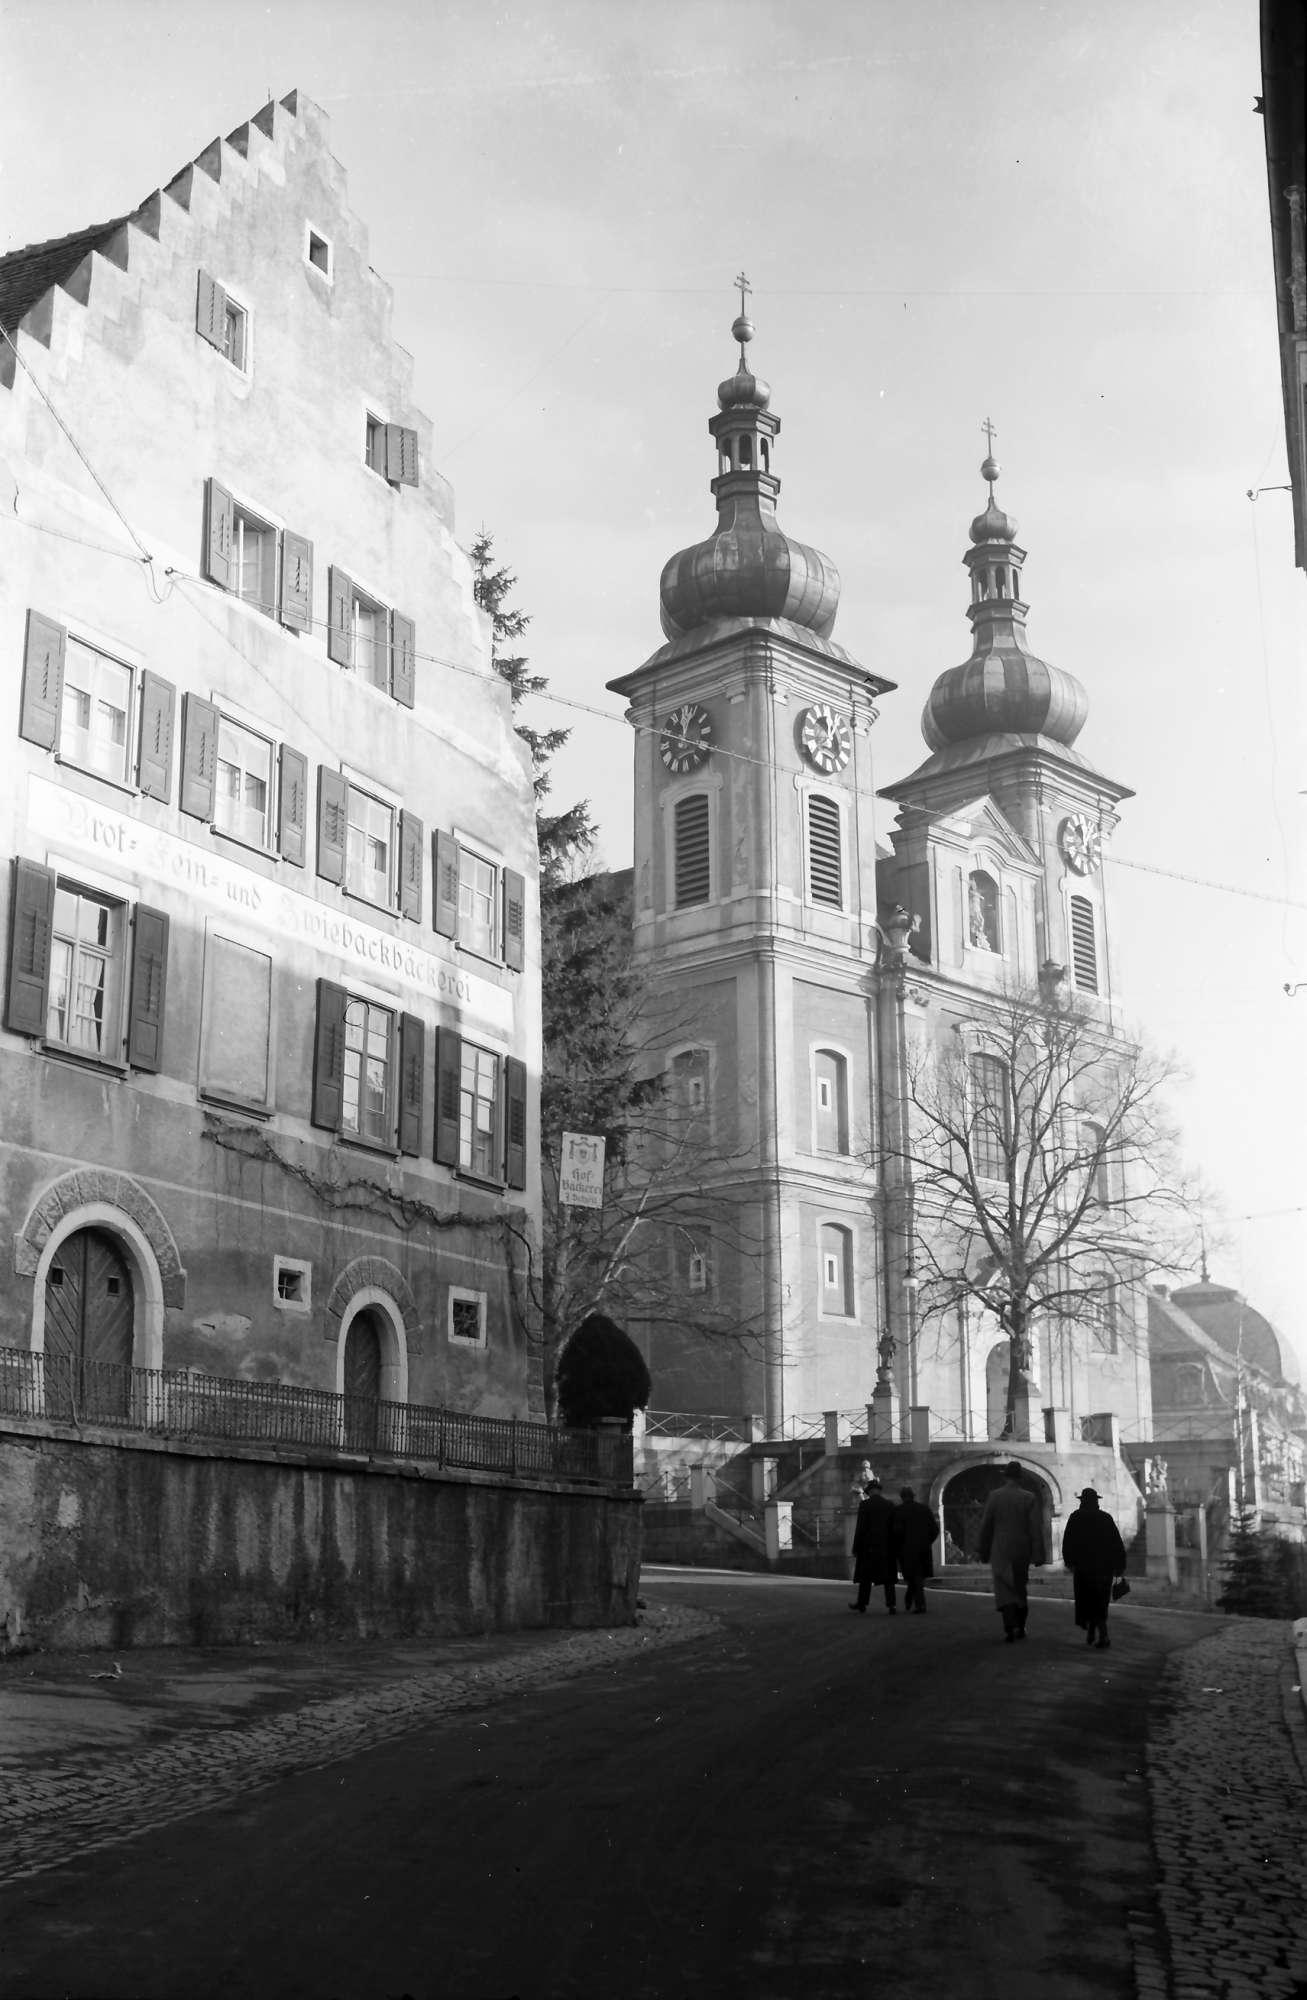 Donaueschingen: Kirche, Bild 1